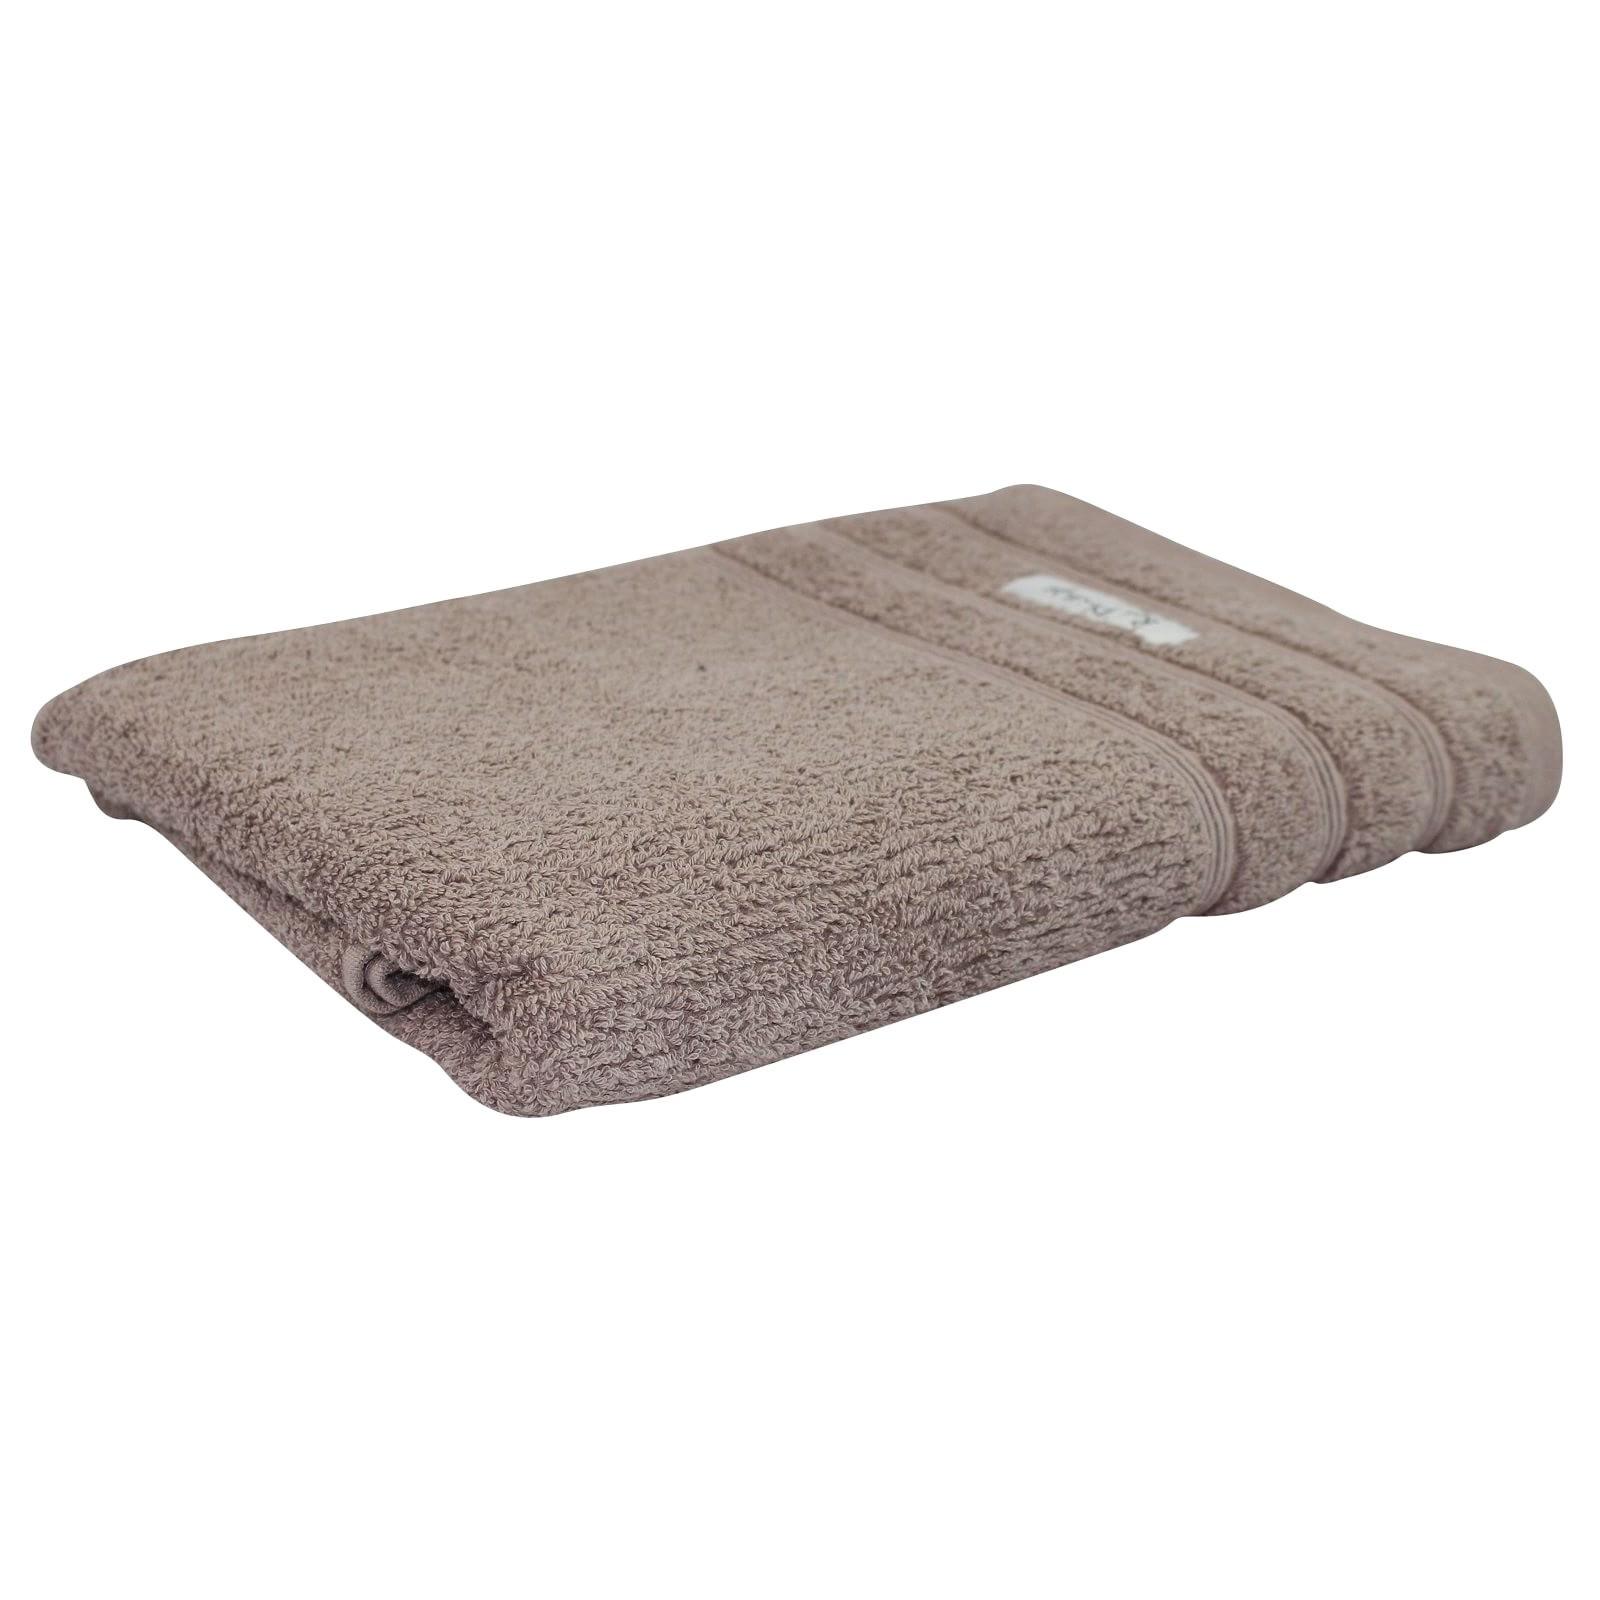 Bas Phillips Cairo Egyptian Cotton Bath Towel, Coffee